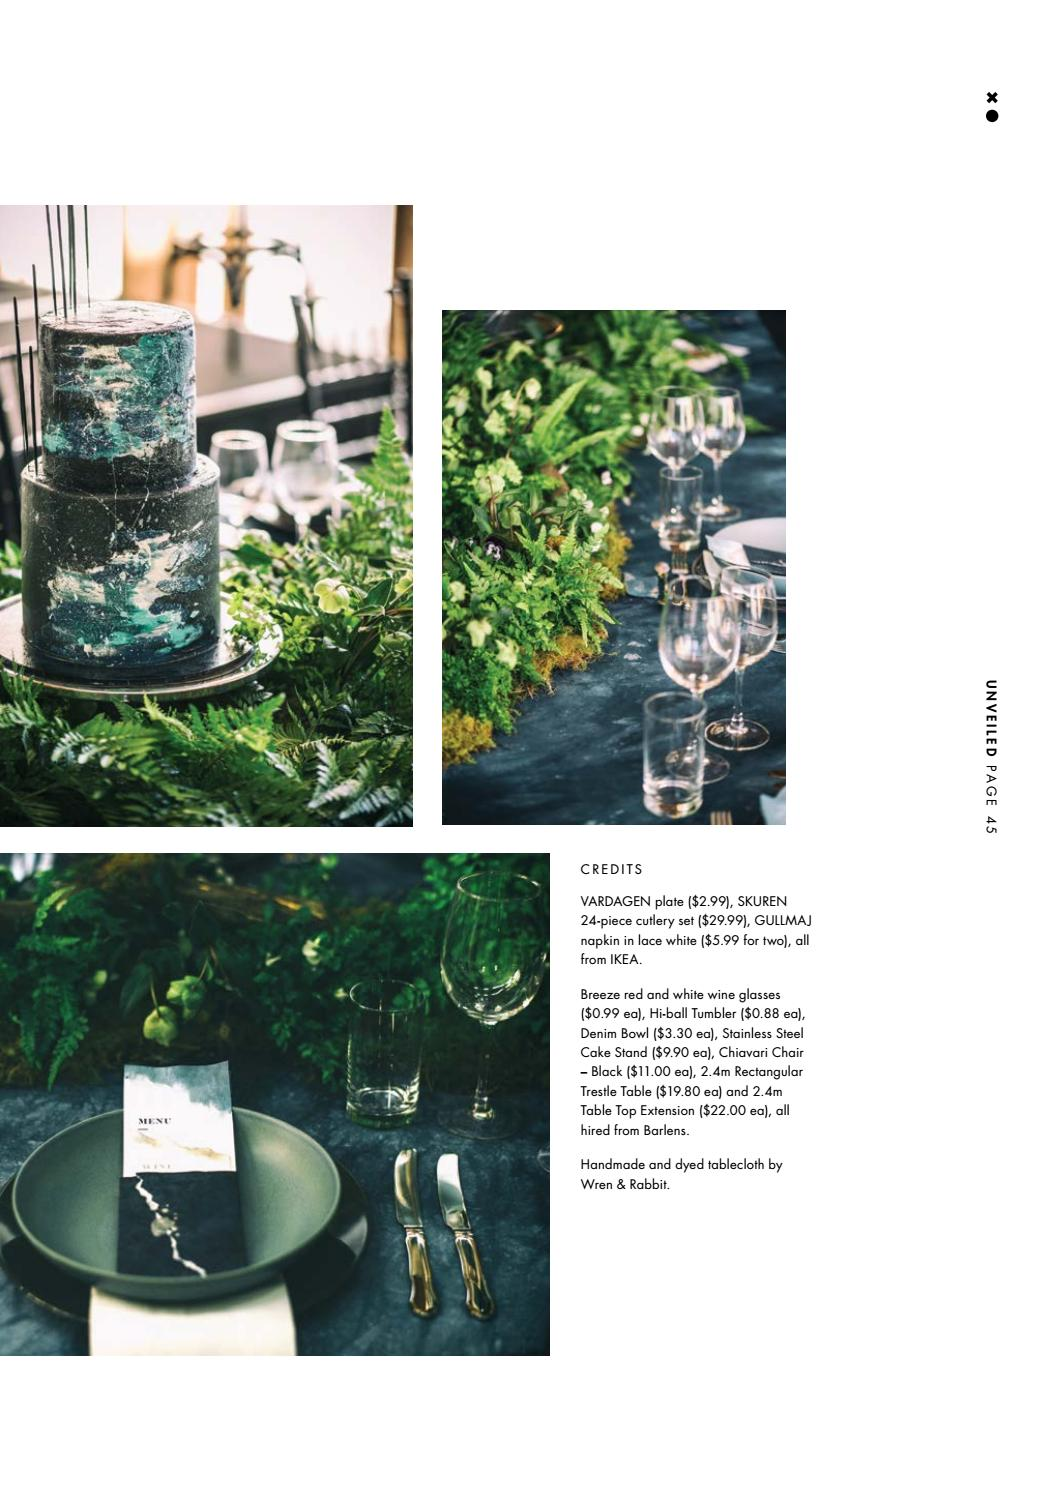 Magazine By Issuu 10Disruption Hercanberra Issue kw0nOP8